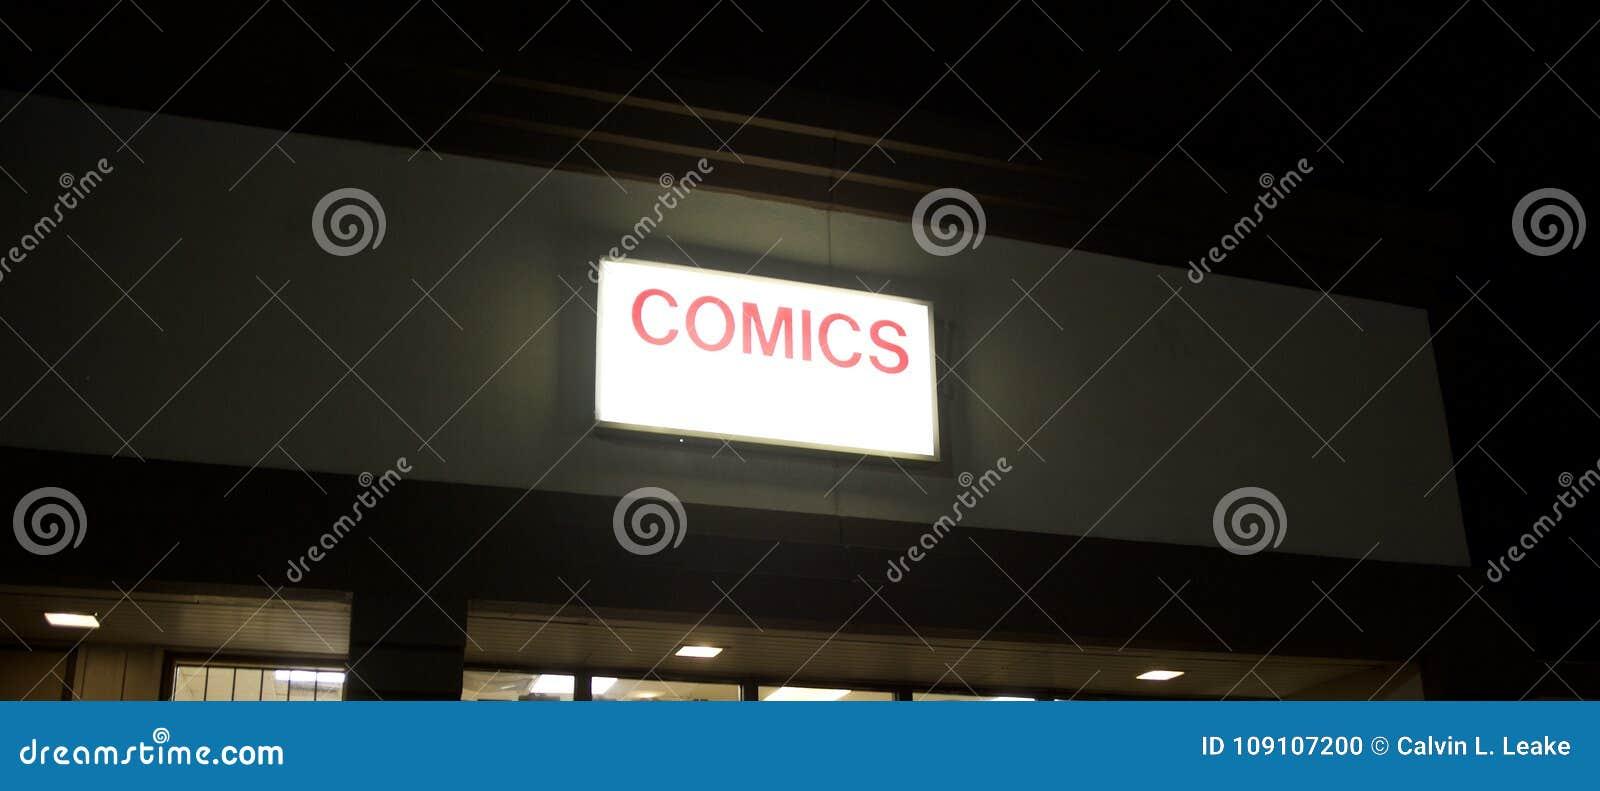 Grappige boekhandel